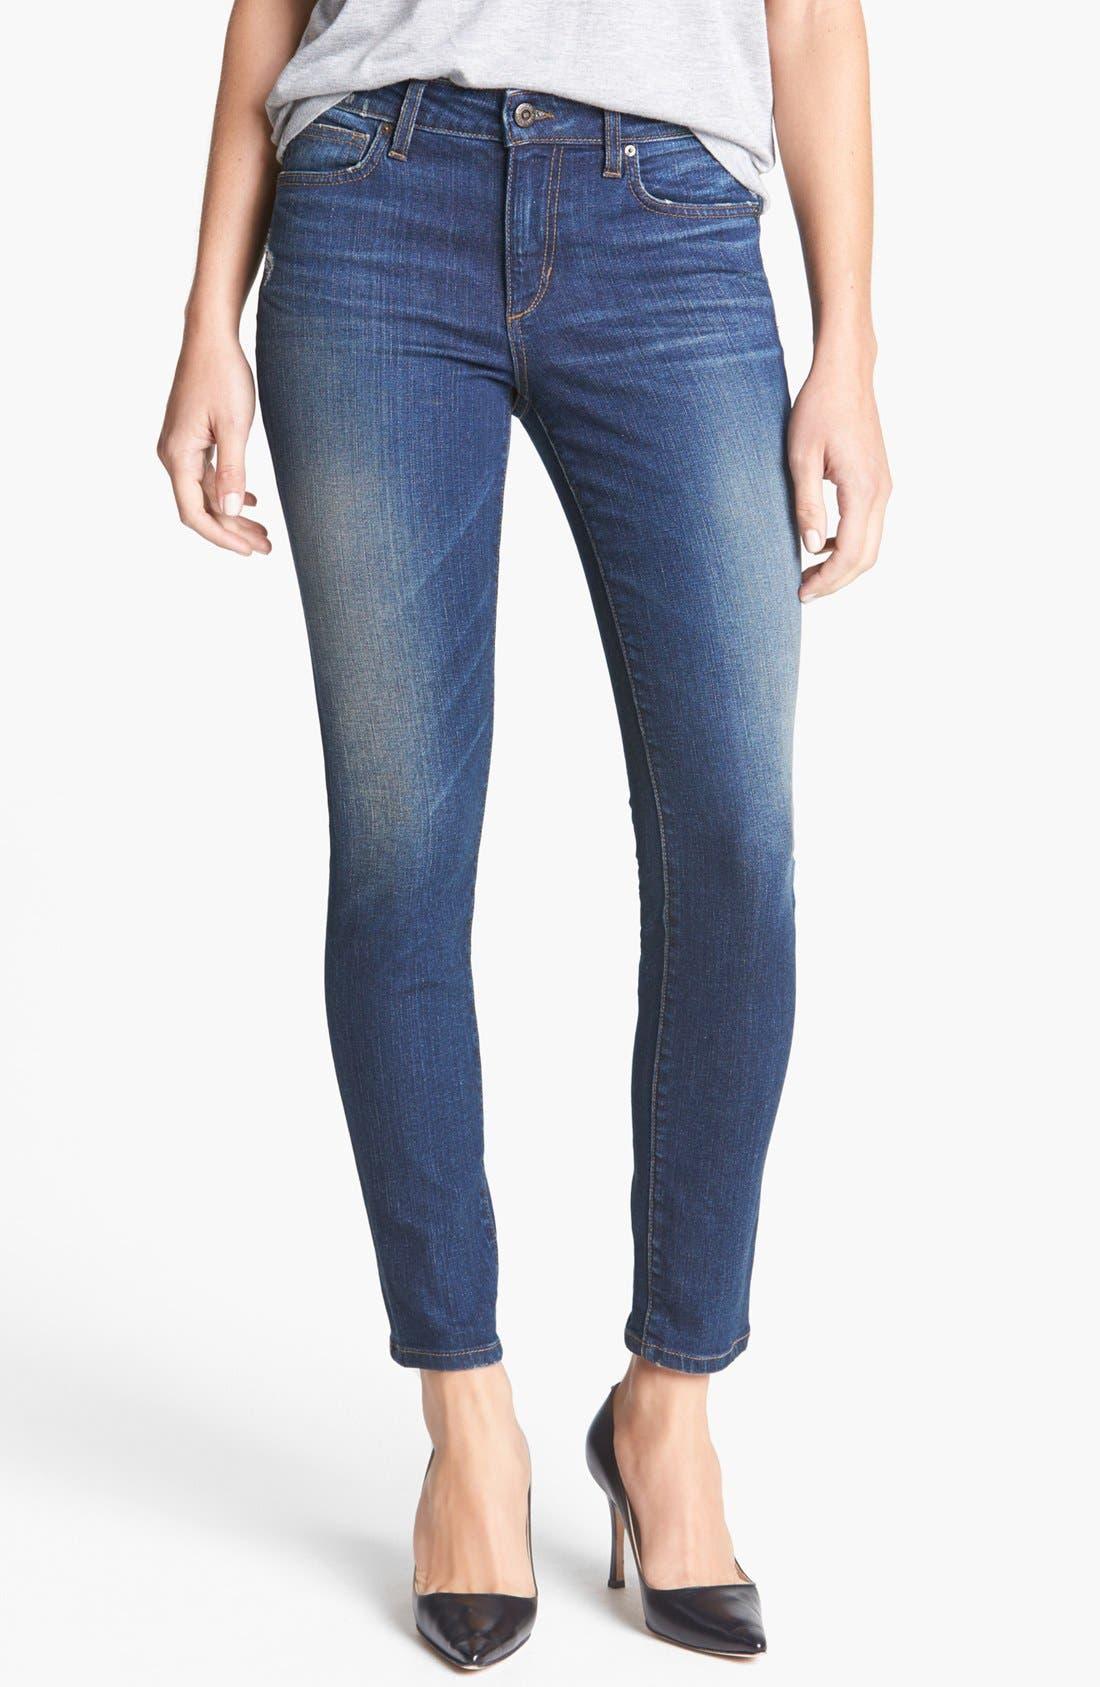 Alternate Image 1 Selected - Joe's Skinny Ankle Jeans (Margaux)